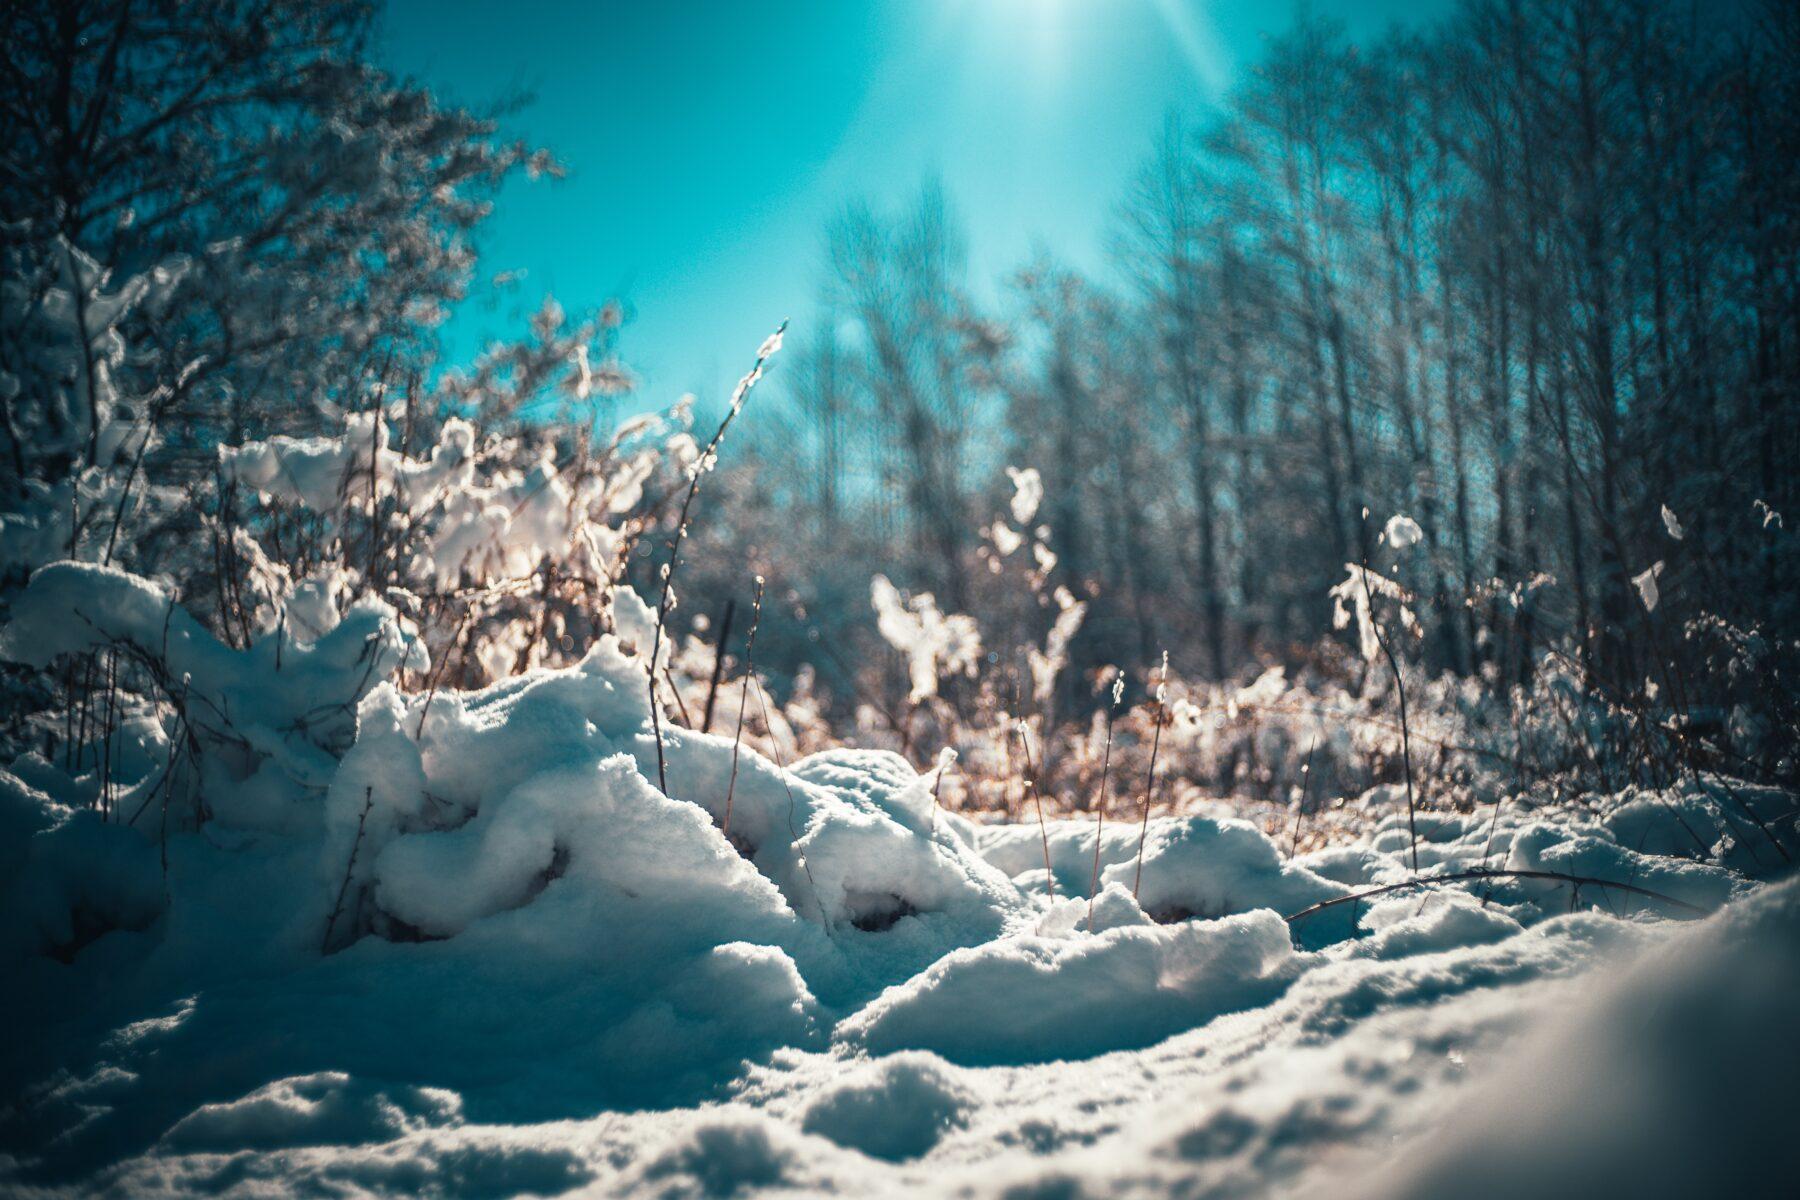 weetjes sneeuw smelten